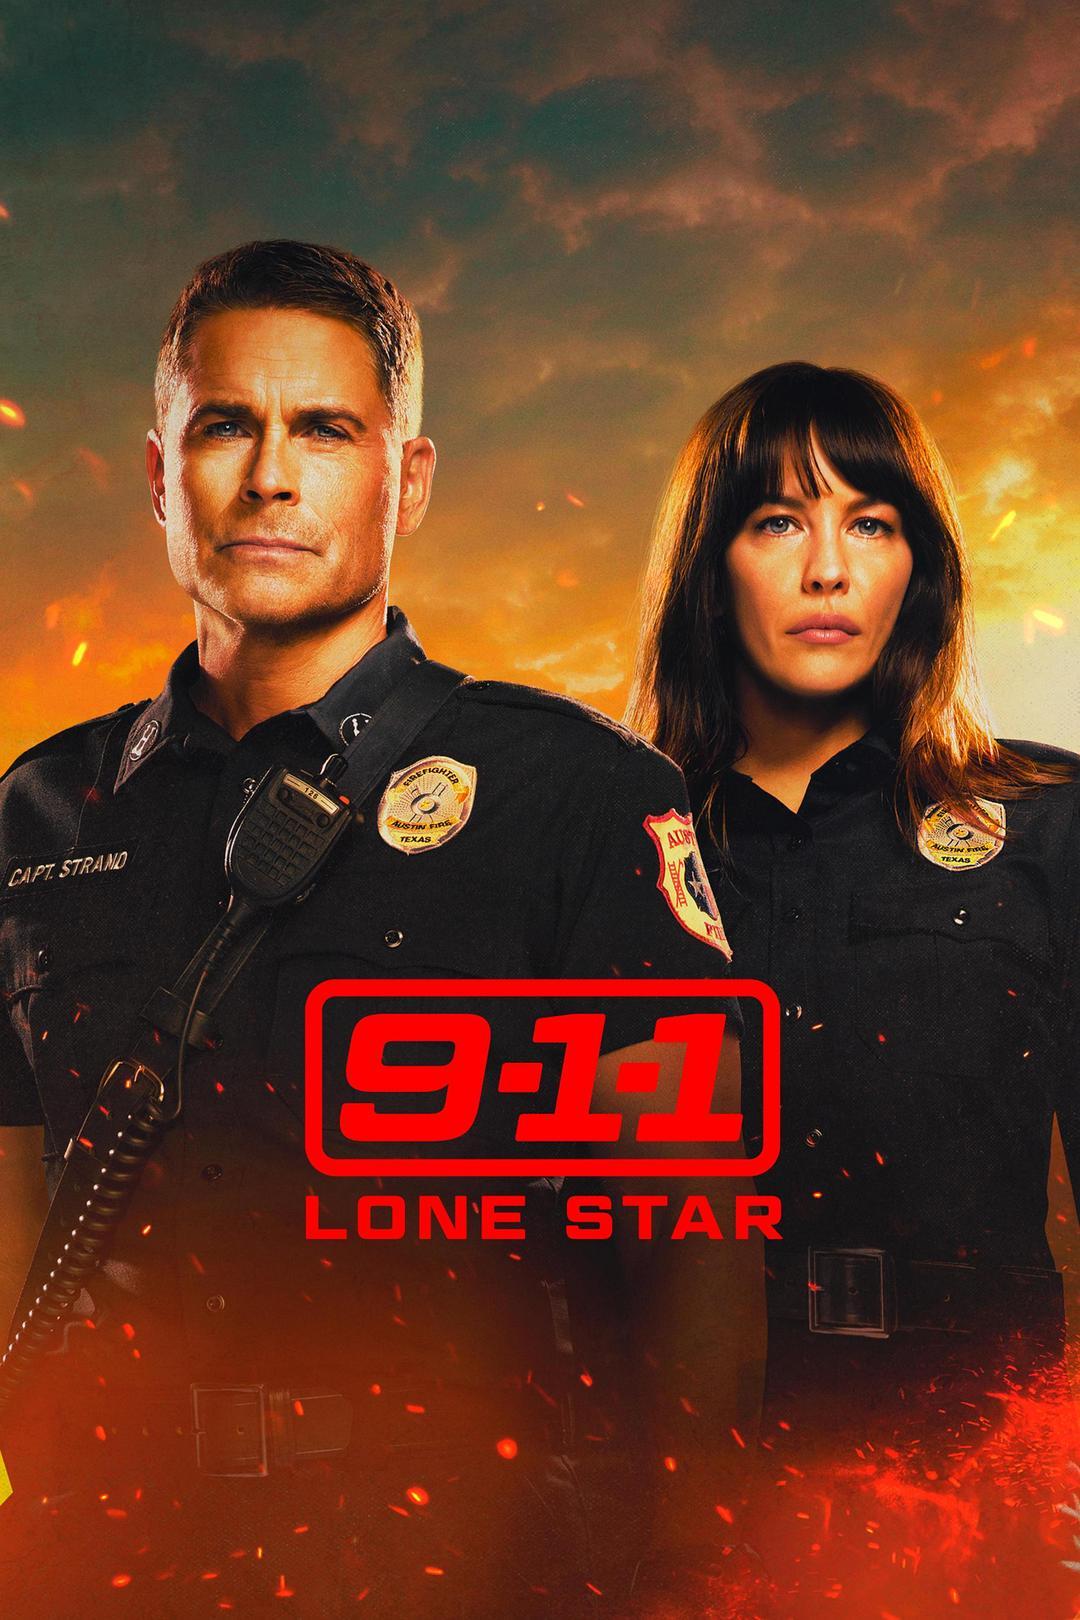 紧急呼救:孤星 9-1-1: Lone Star